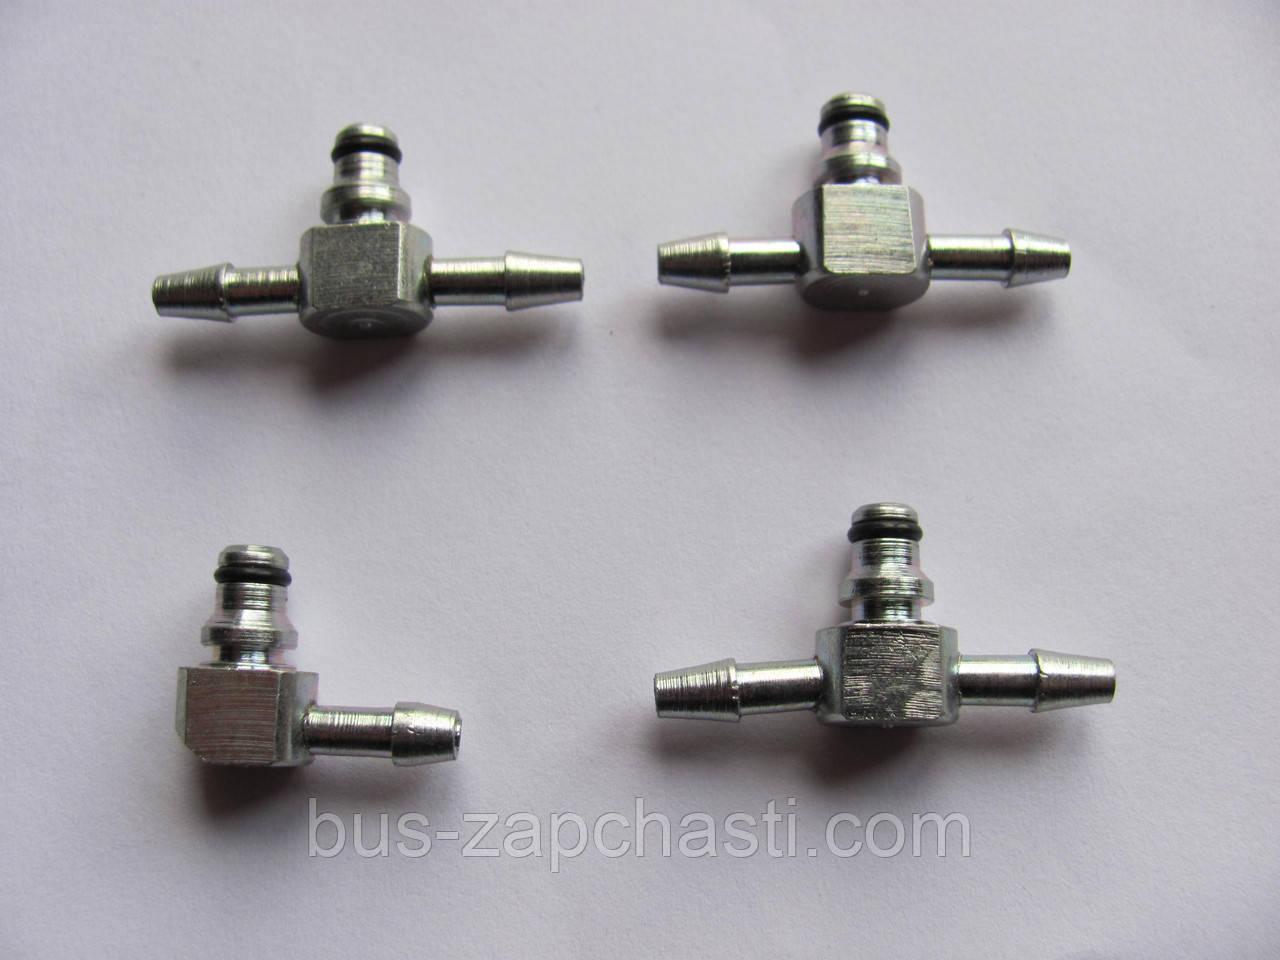 Штуцер шланга обратки (компл./метал) MB Sprinter/Vito 2.2 CDI (OM611) 2000-2006 — Rotweiss (Турция) — RW07007